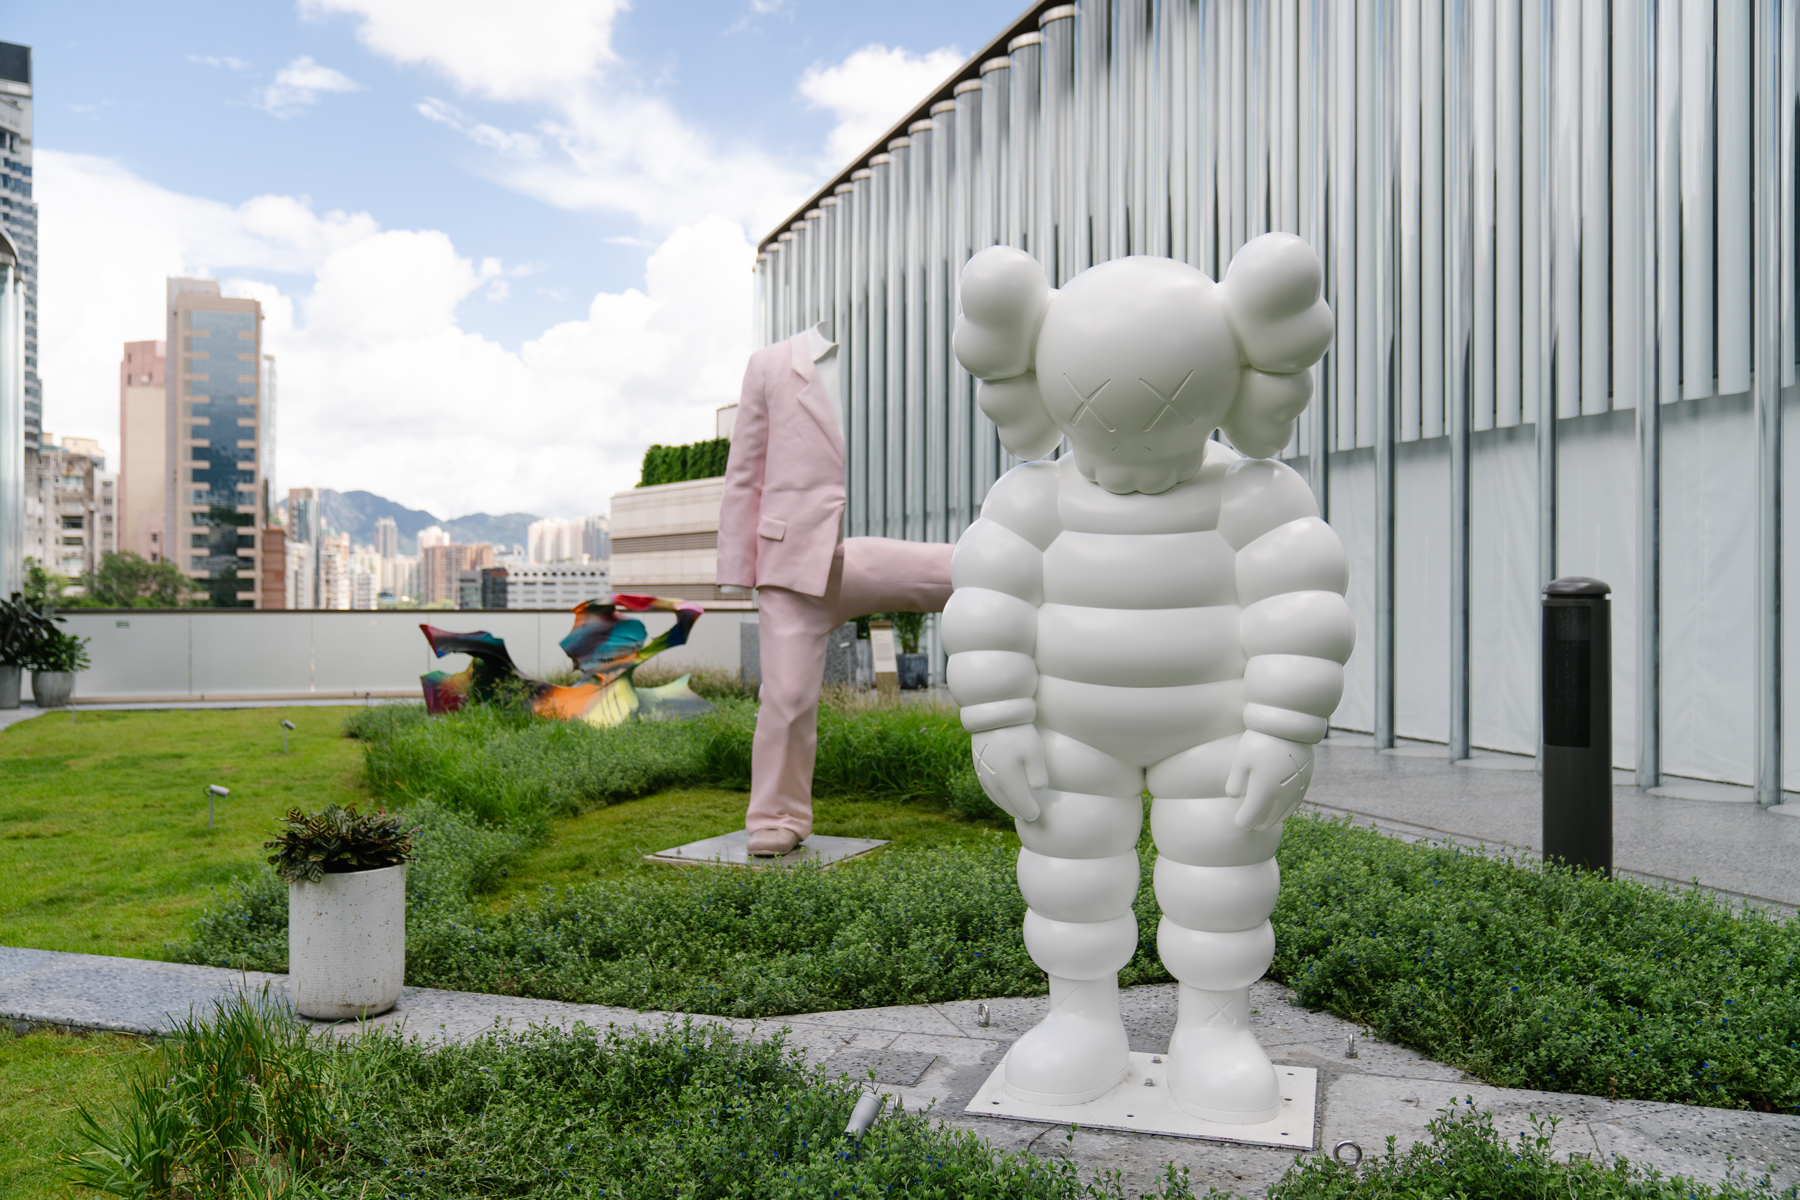 Kaws、草間彌生藝術品進駐全新藝術空間 K11 Art & Cultural Centre 及 K11 雕塑公園